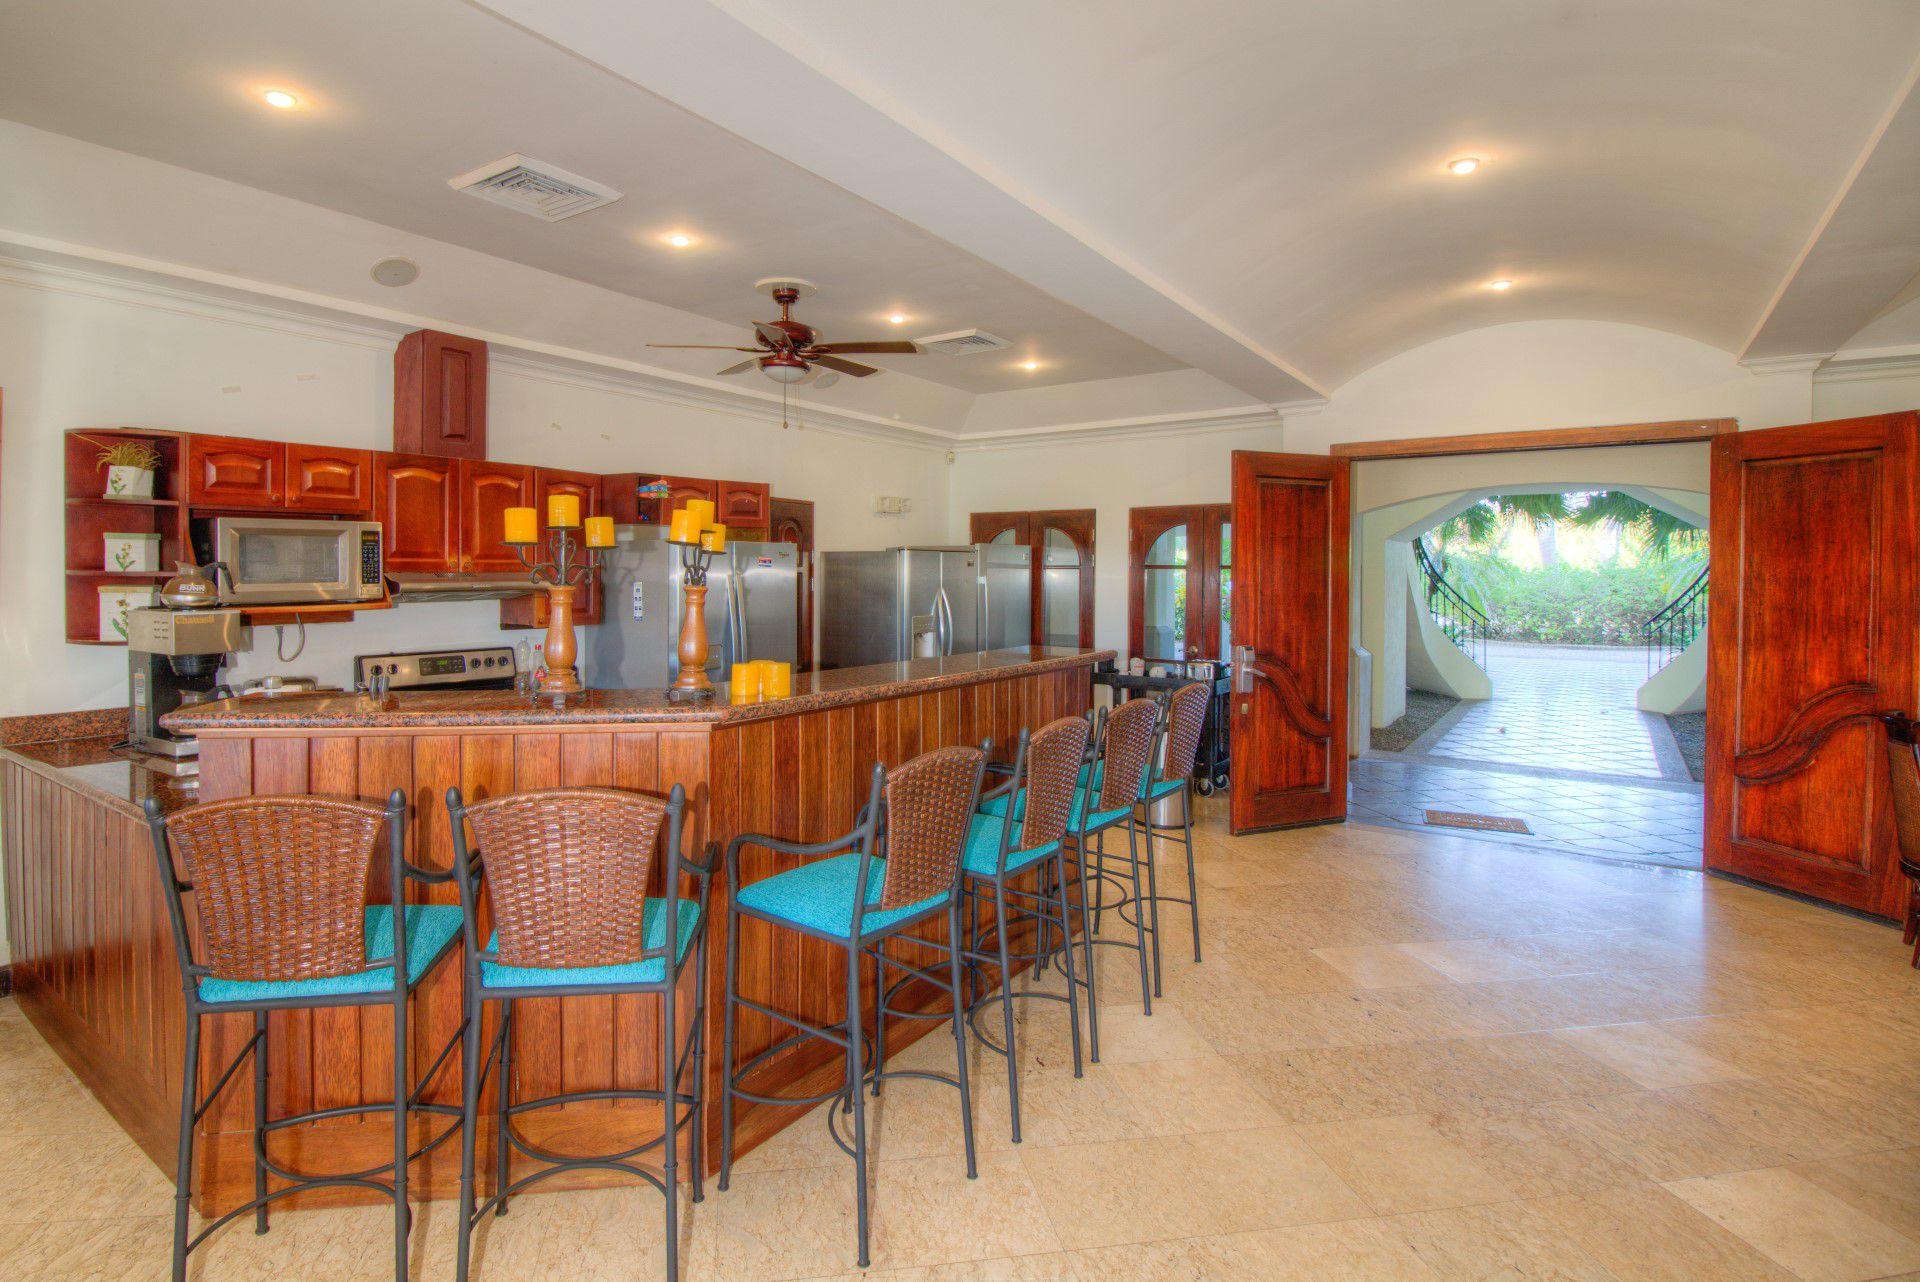 Ground floor kitchen with bar seating